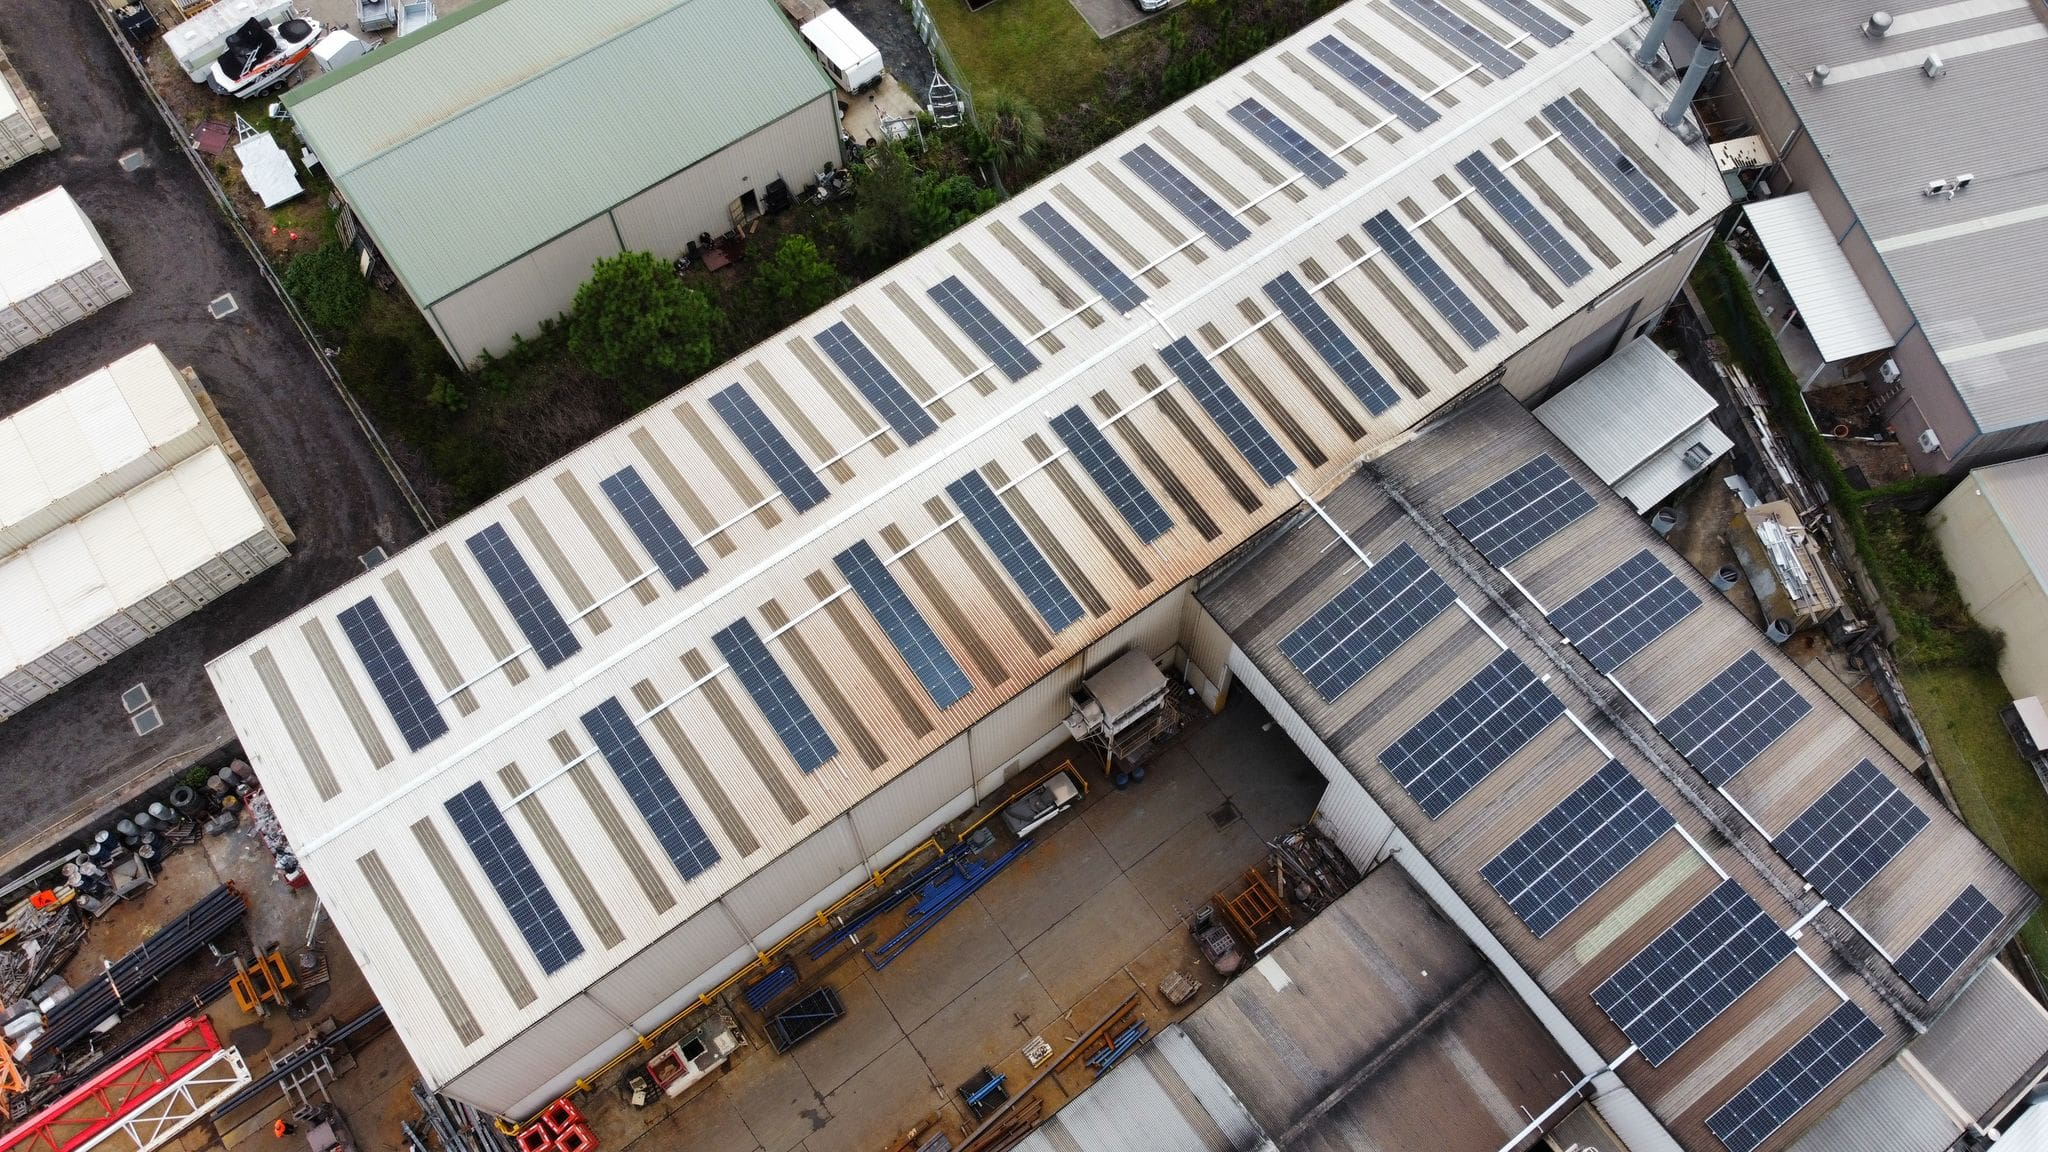 Commercial Solar System Installers - CJ Electrical & Solar